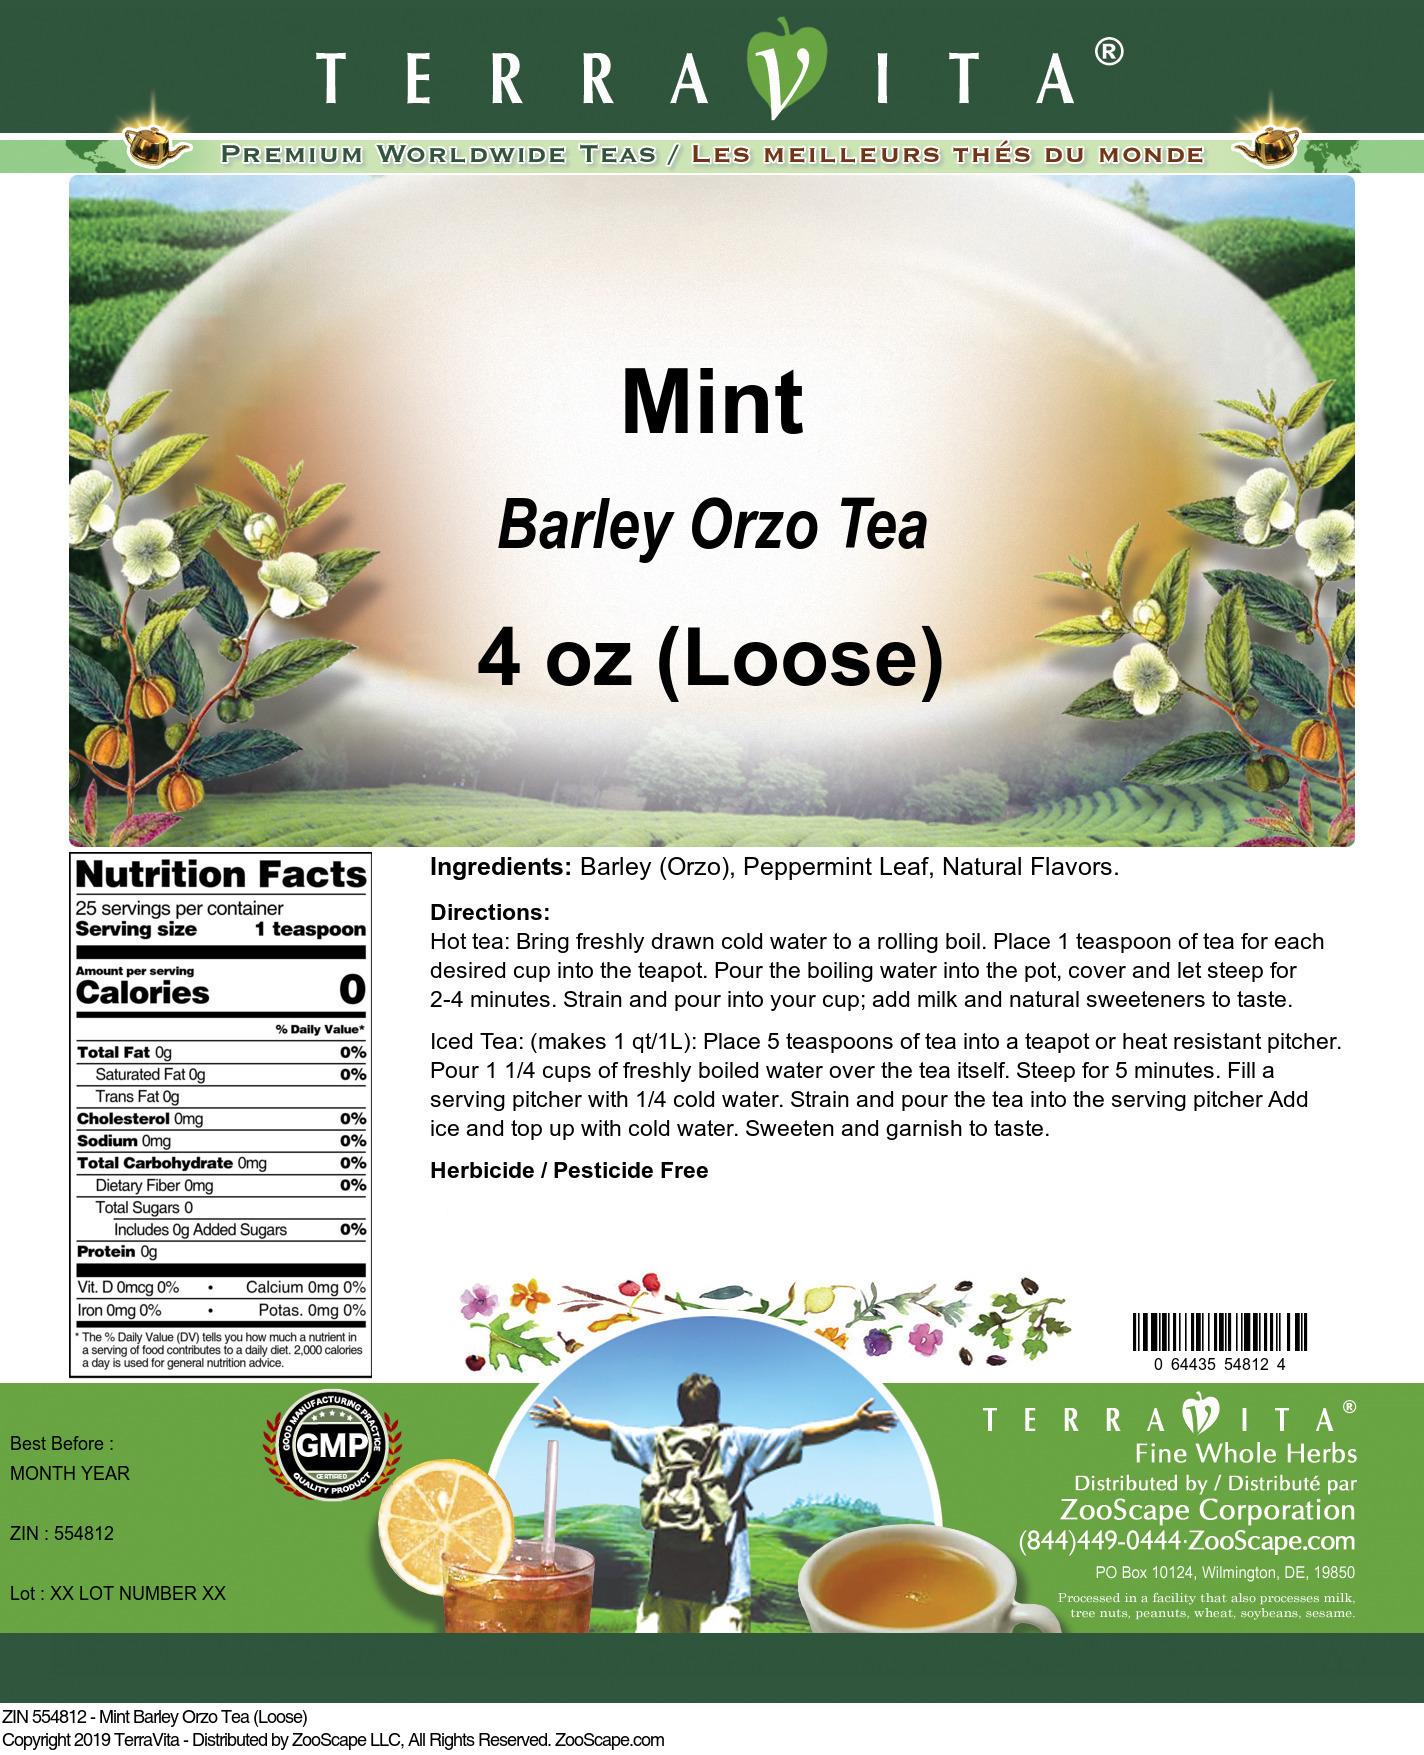 Mint Barley Orzo Tea (Loose)